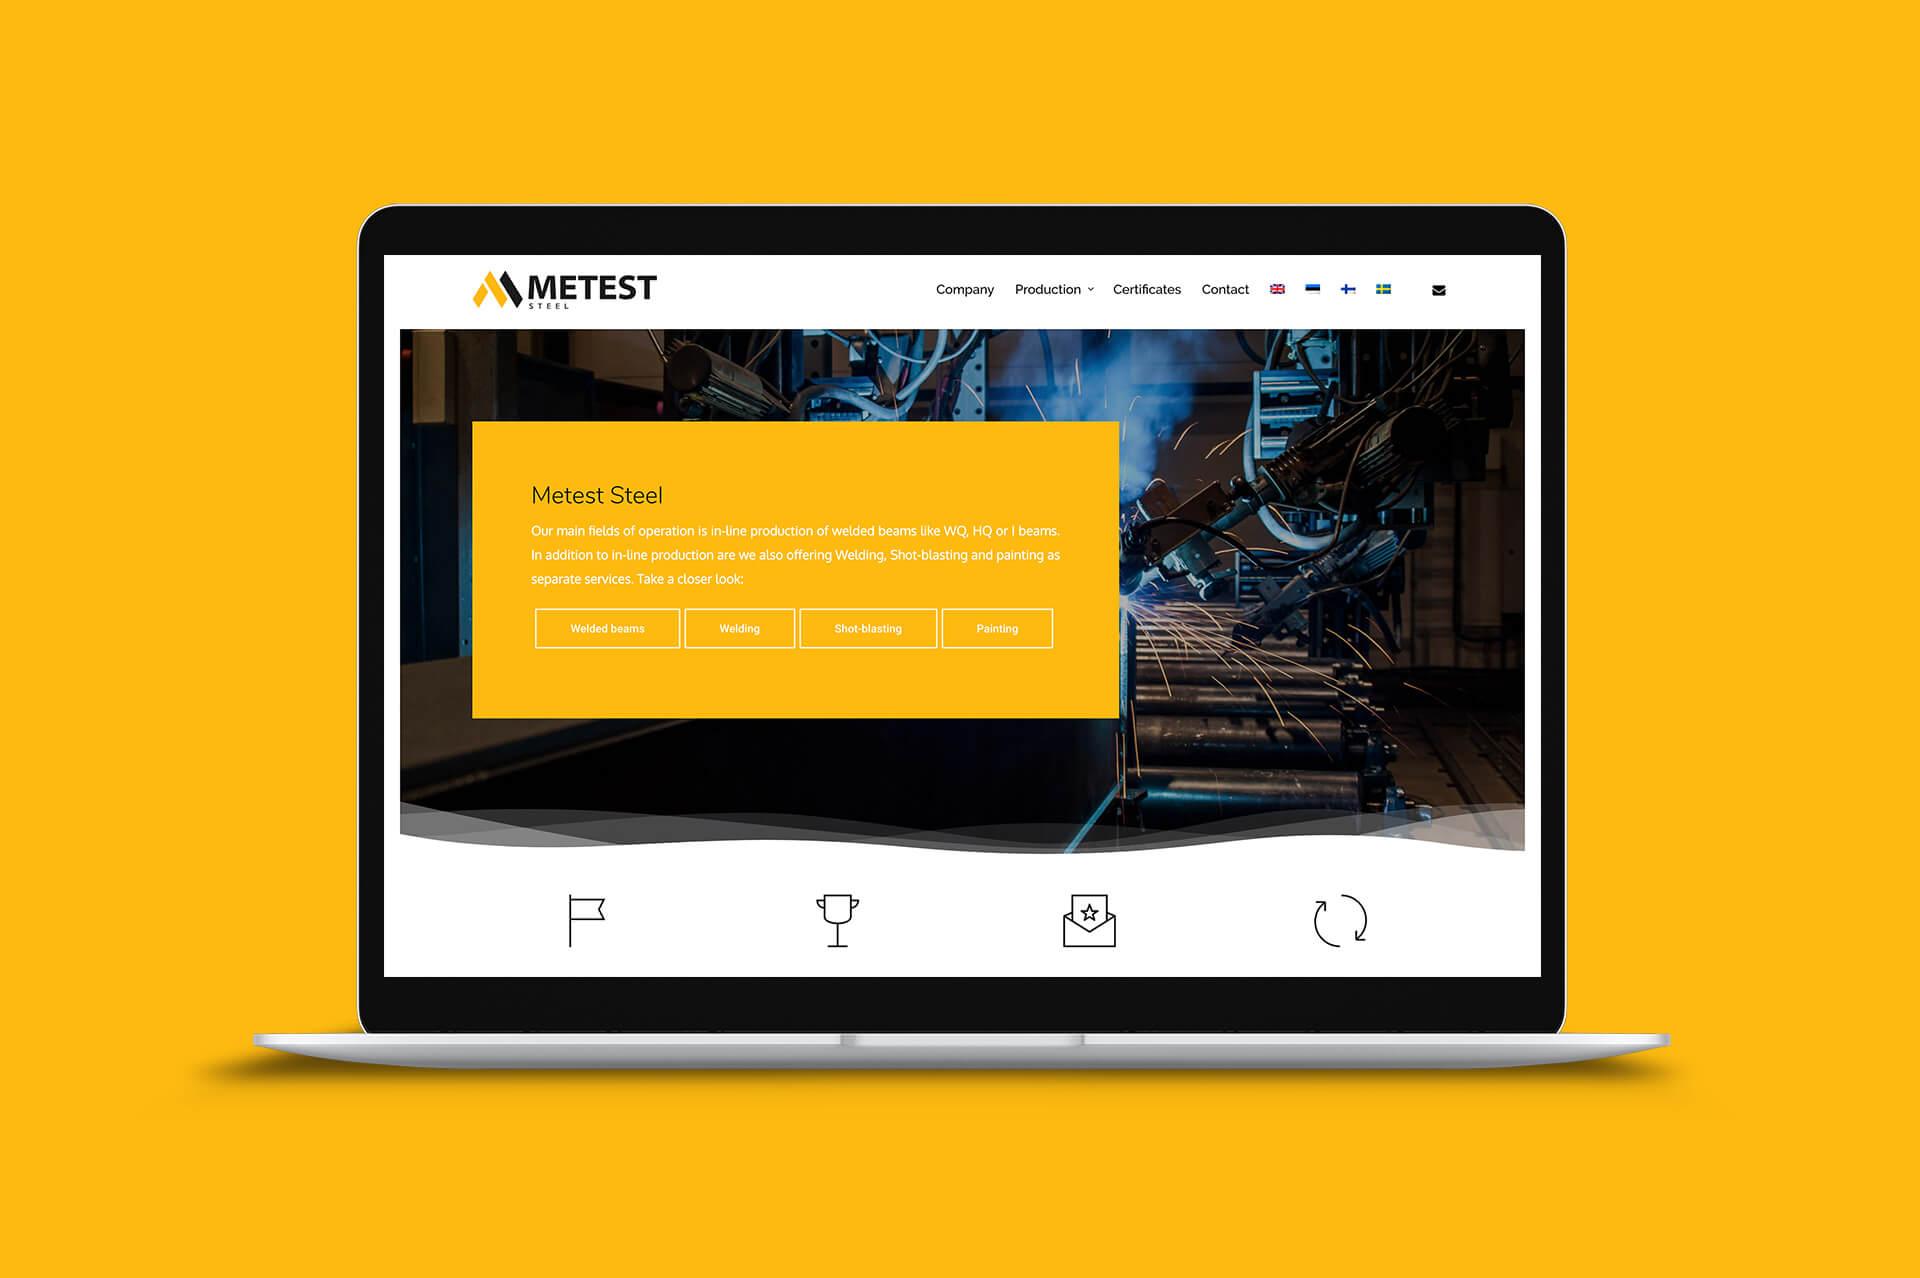 METEST – metallitööstuste grupp